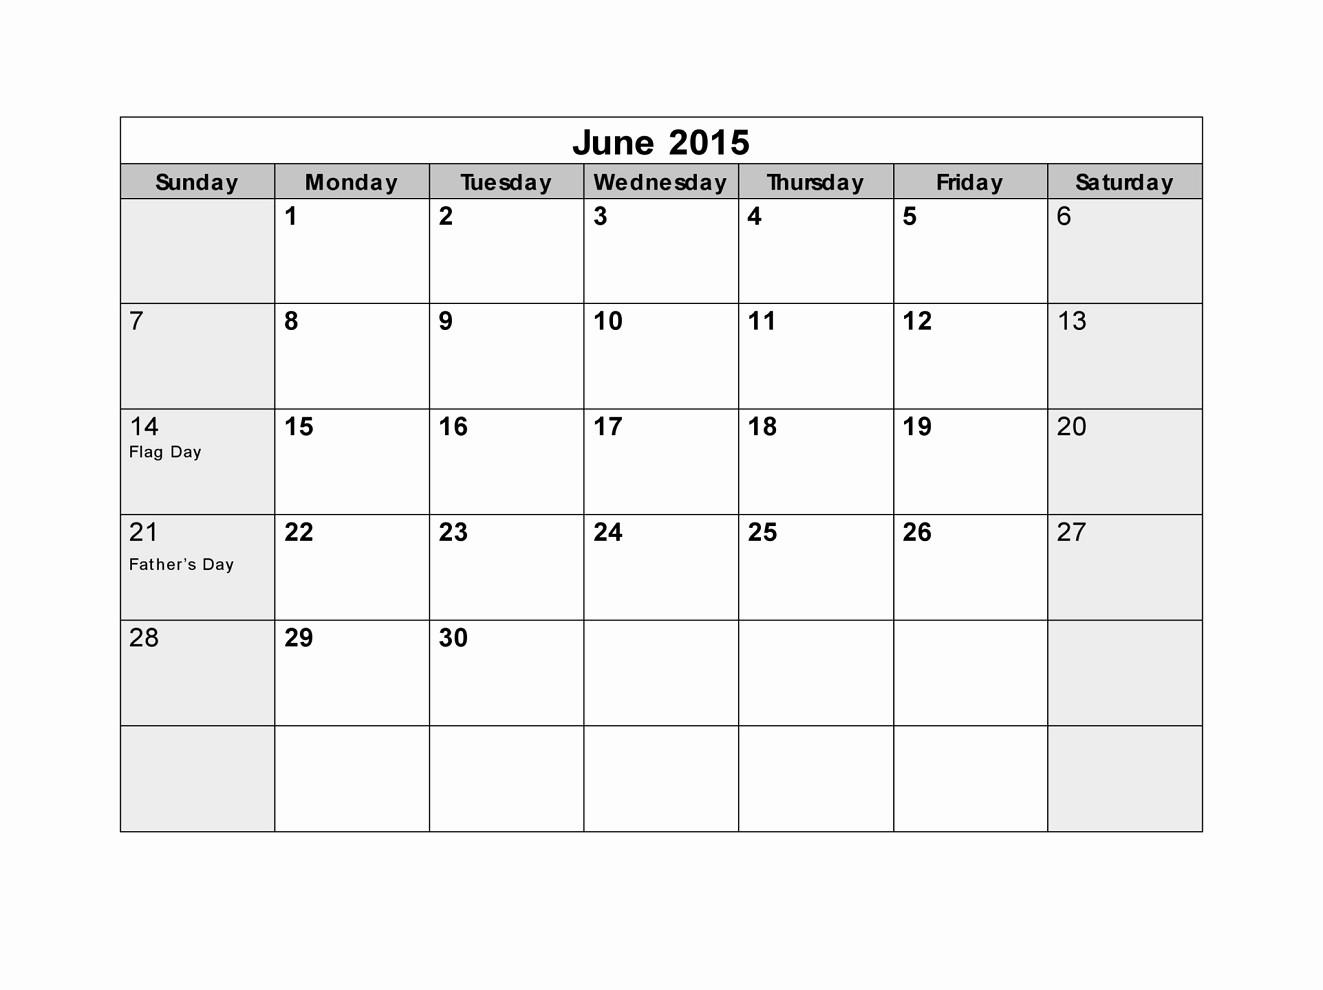 Printable 3 Month Calendar 2015 Lovely Printable Blank Monthly Calendar 2015 Part 1